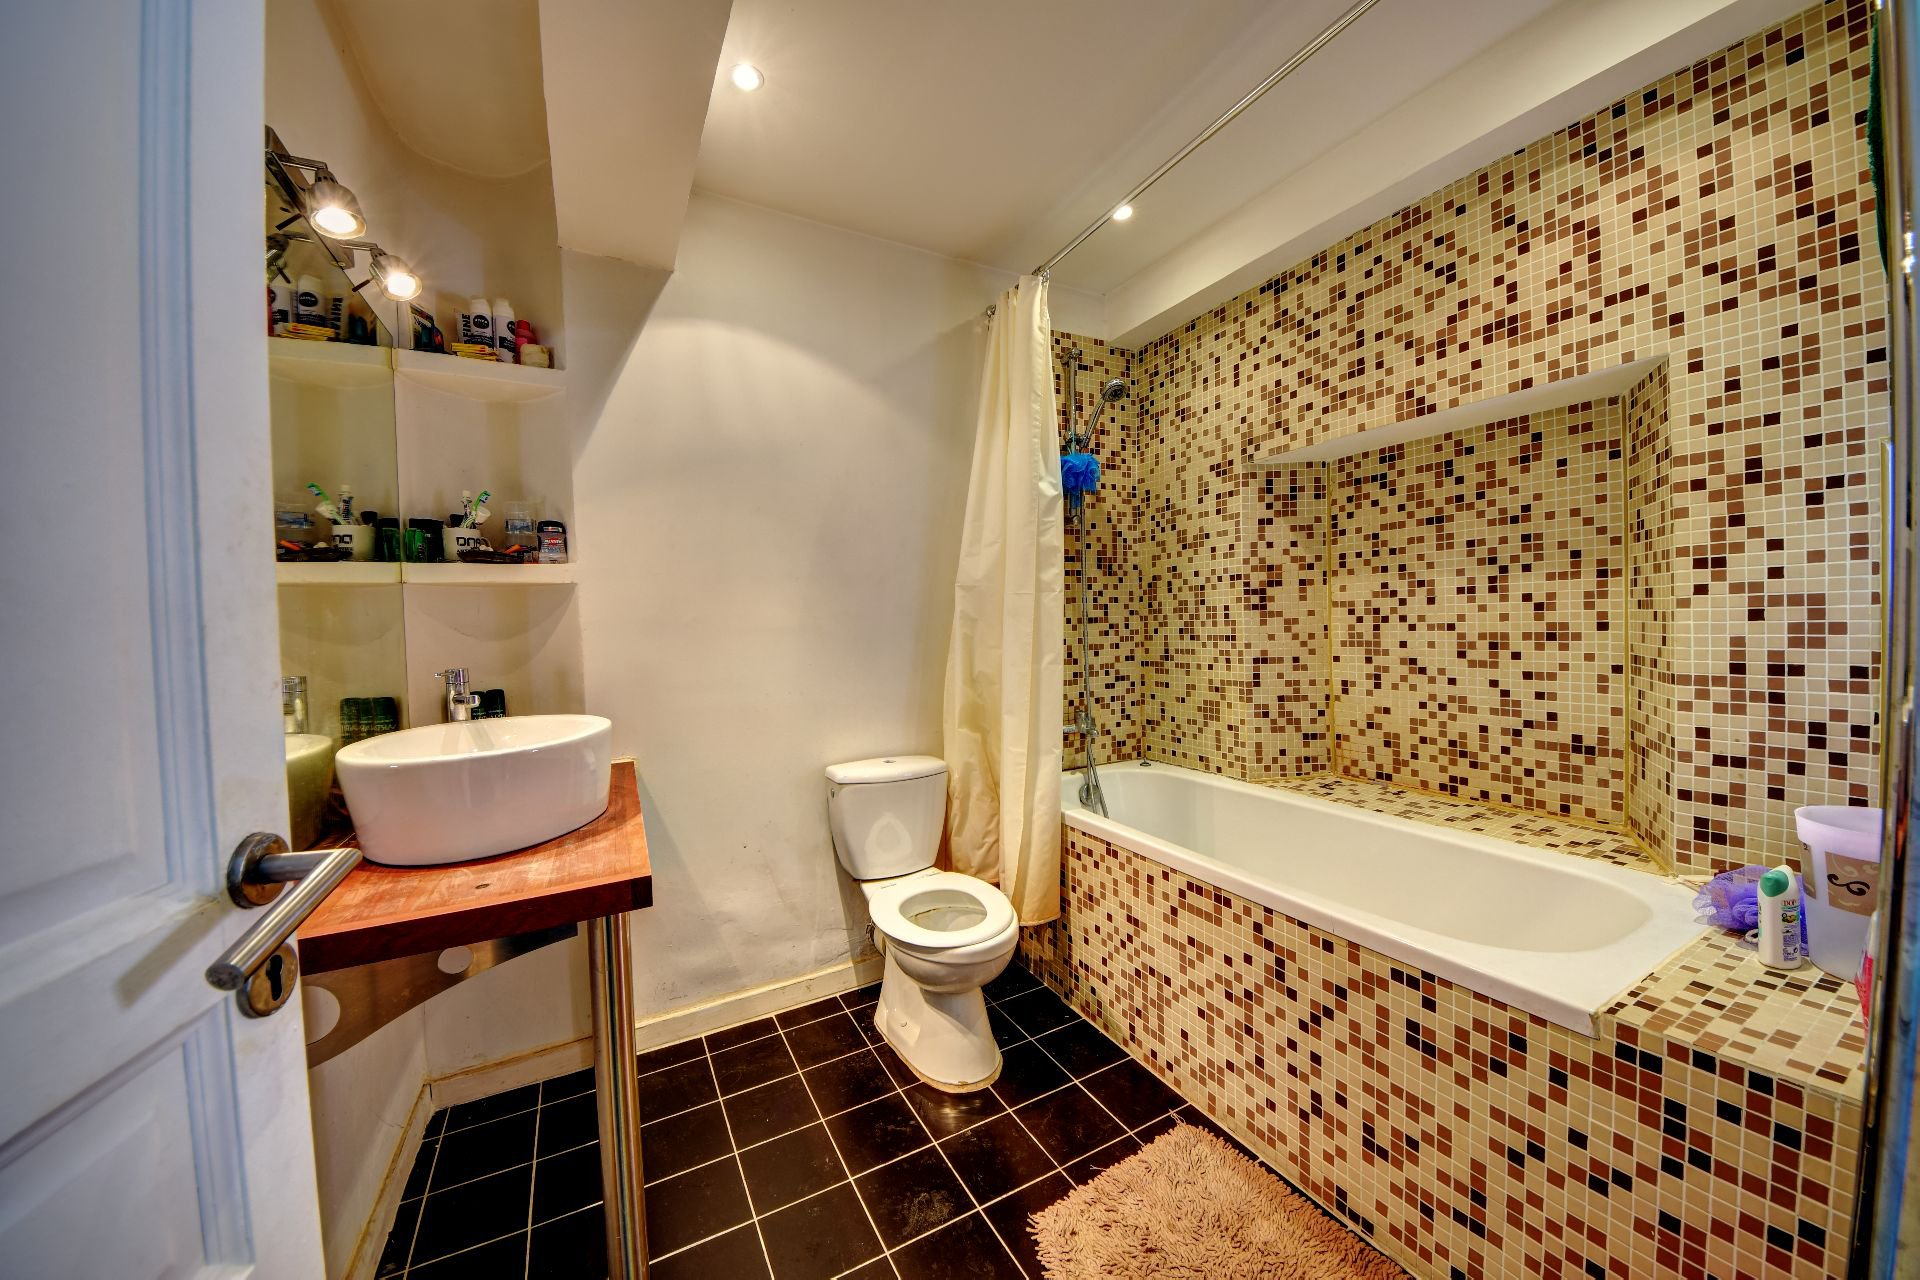 Bathroom of the renovated house medieval center, Aups, Var, Verdon, Provence